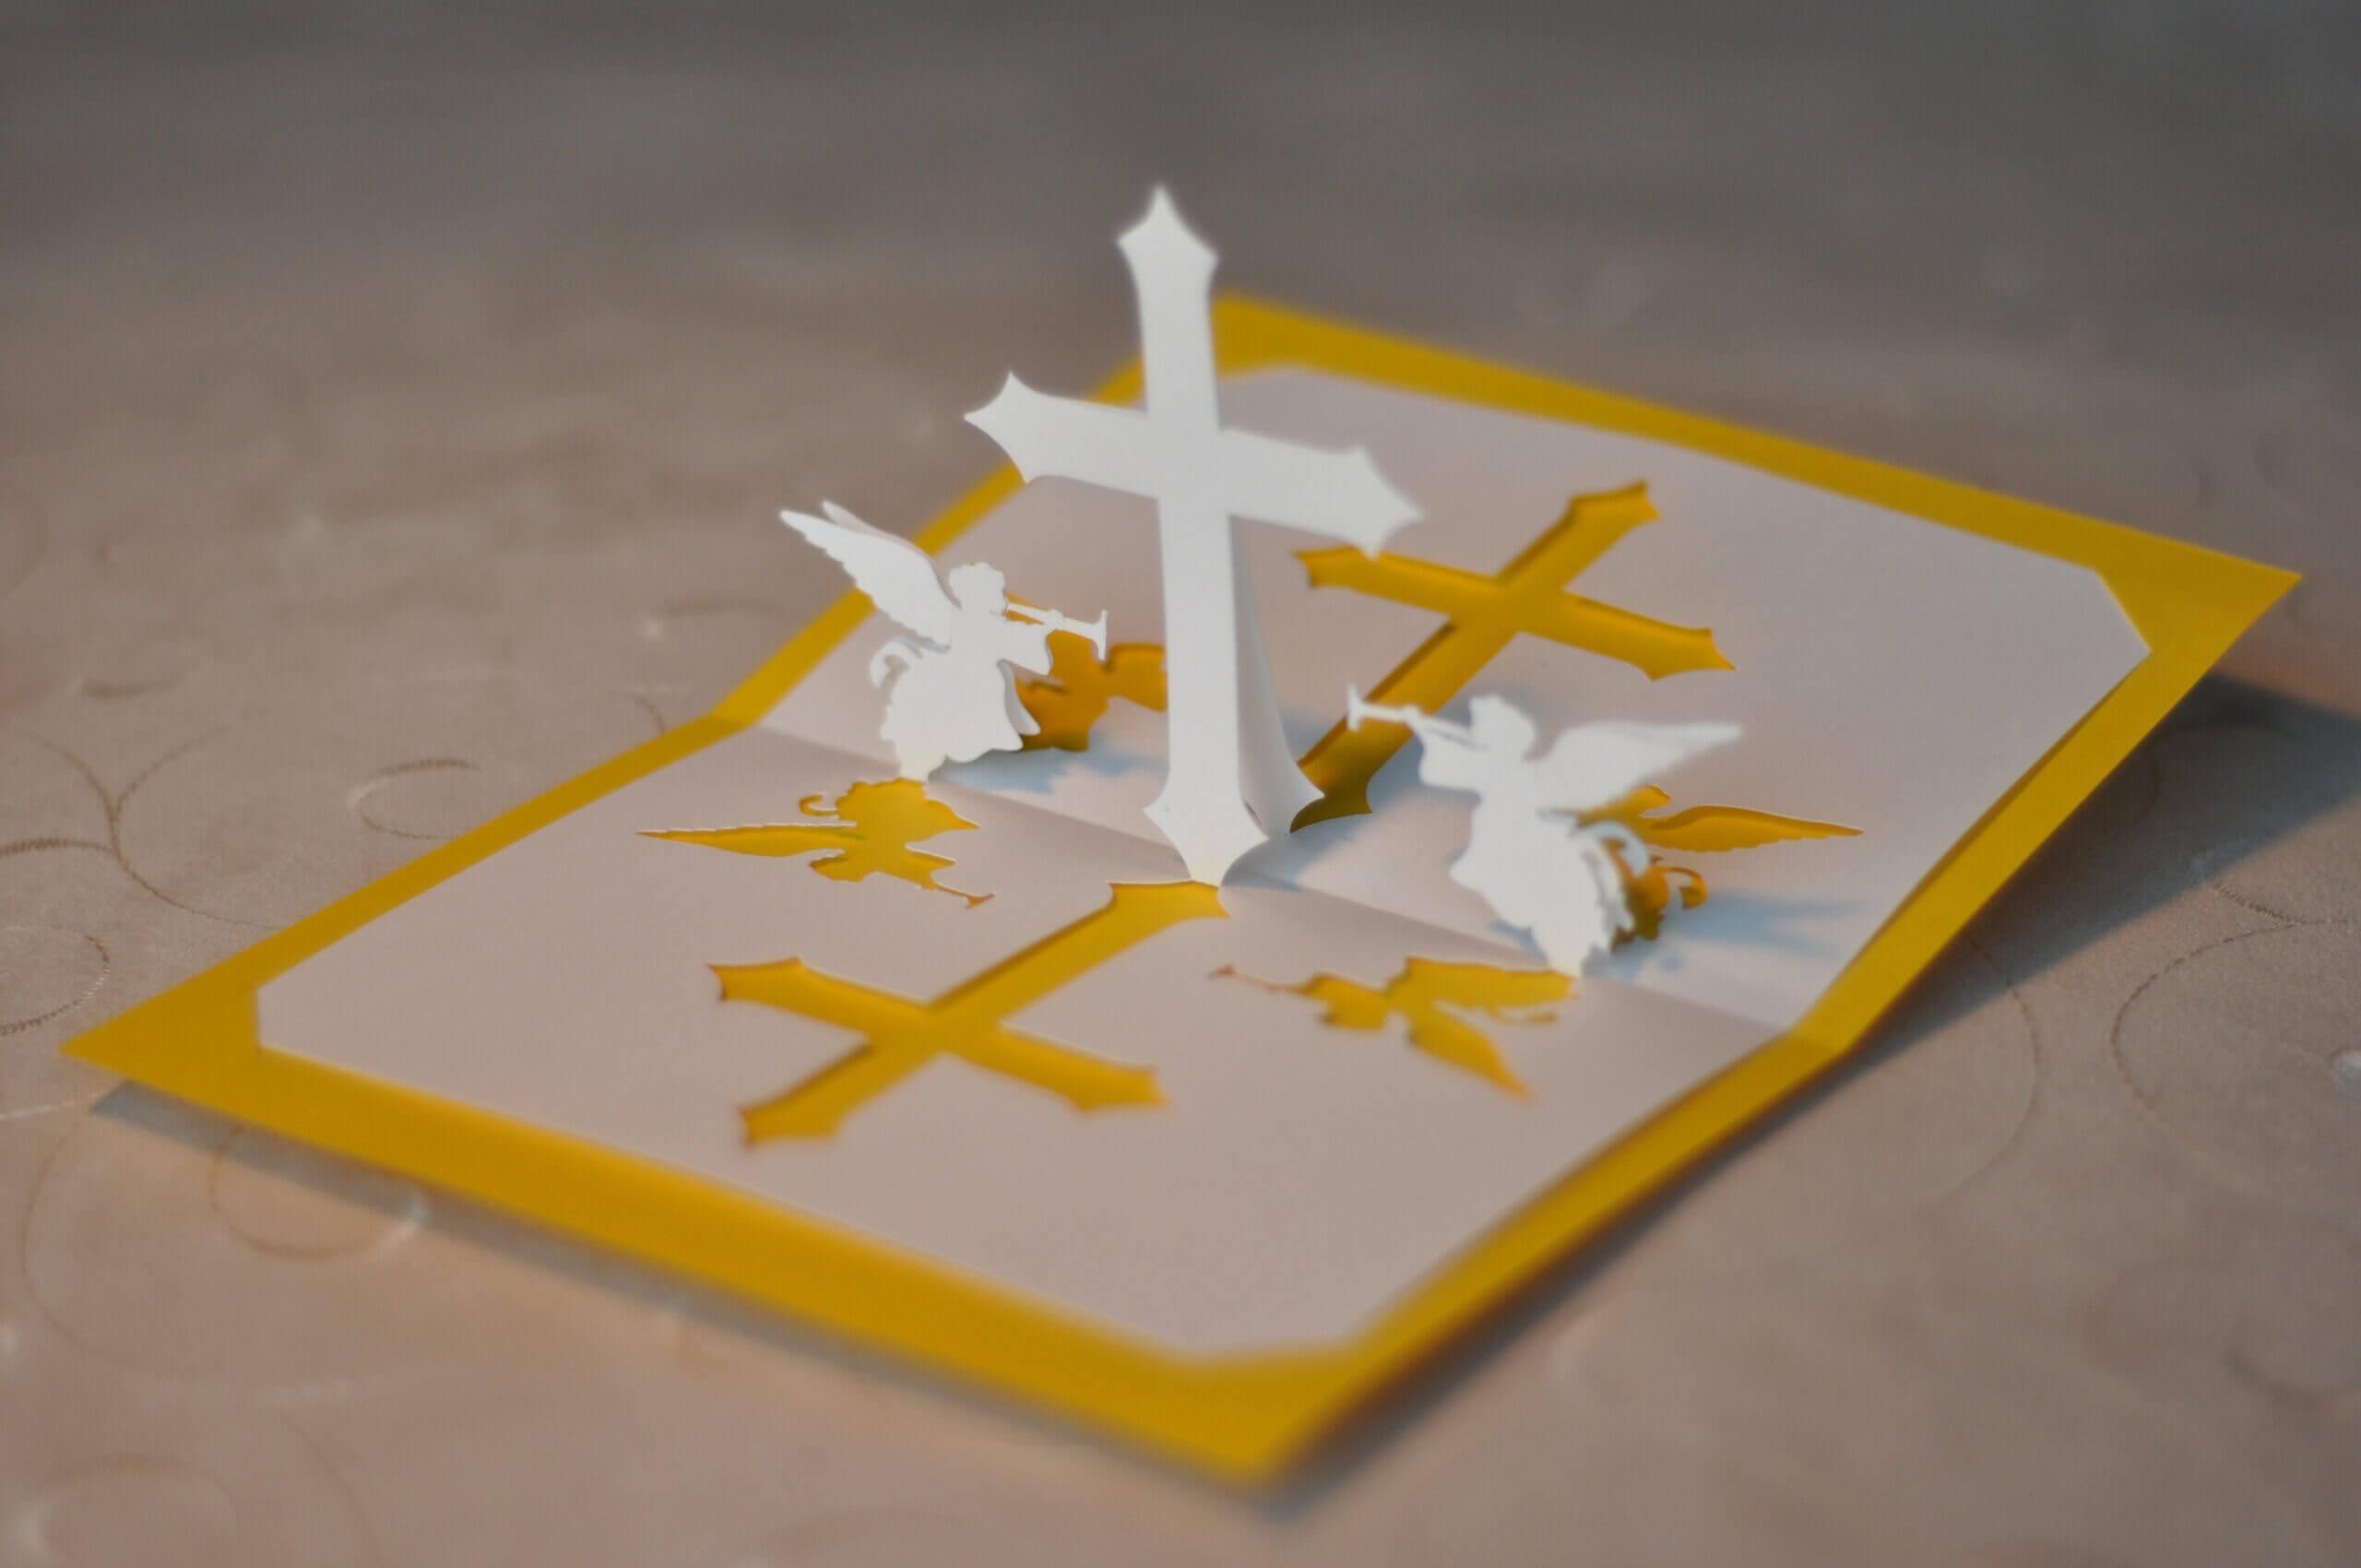 Pop Up Easter Card Template Ks2 Maxresdefault – Happy Easter Inside Easter Card Template Ks2